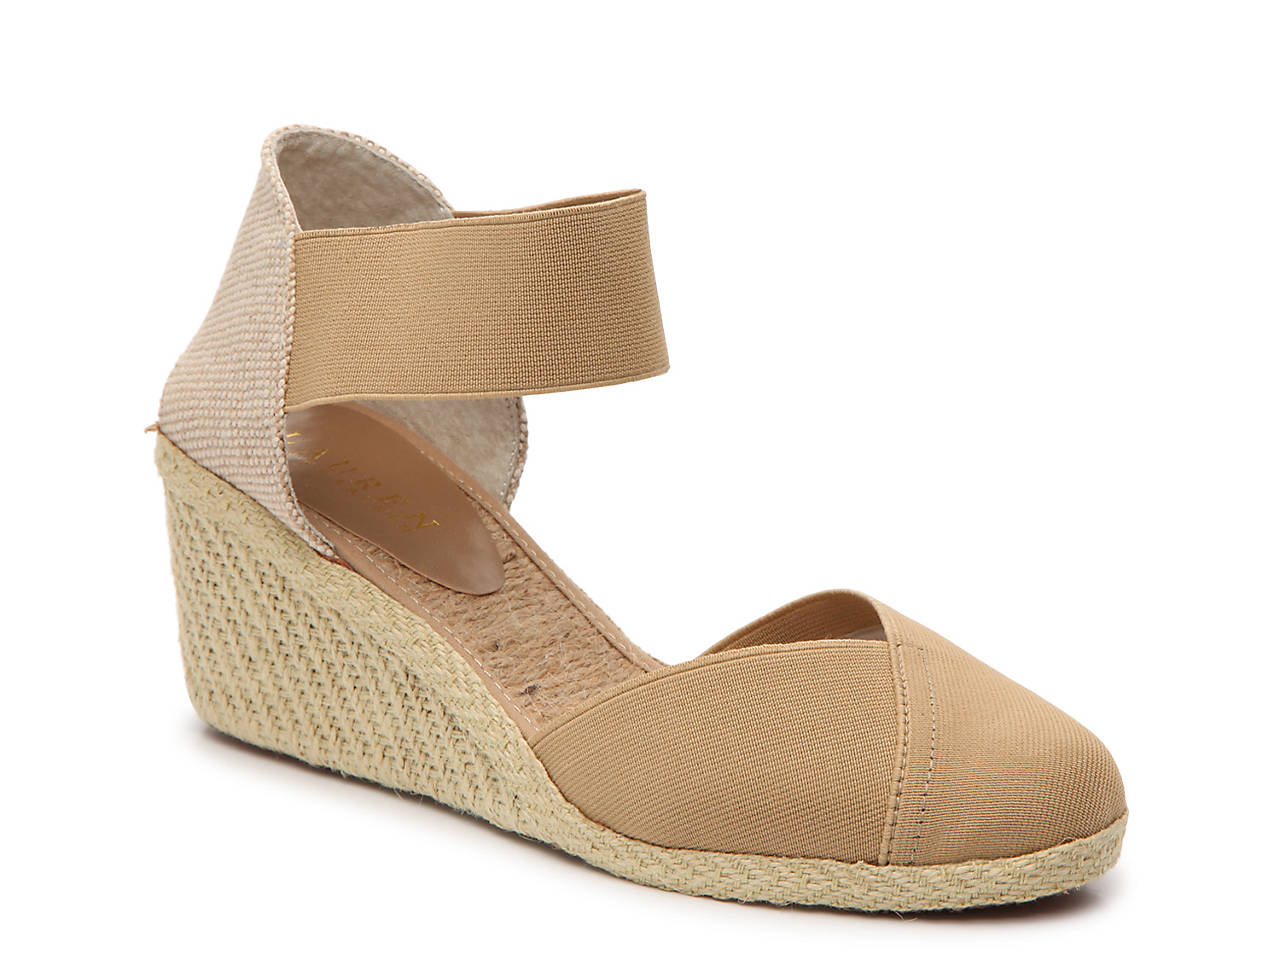 0e5d17de06a Lauren Ralph Lauren Charla Wedge Sandal Women s Shoes